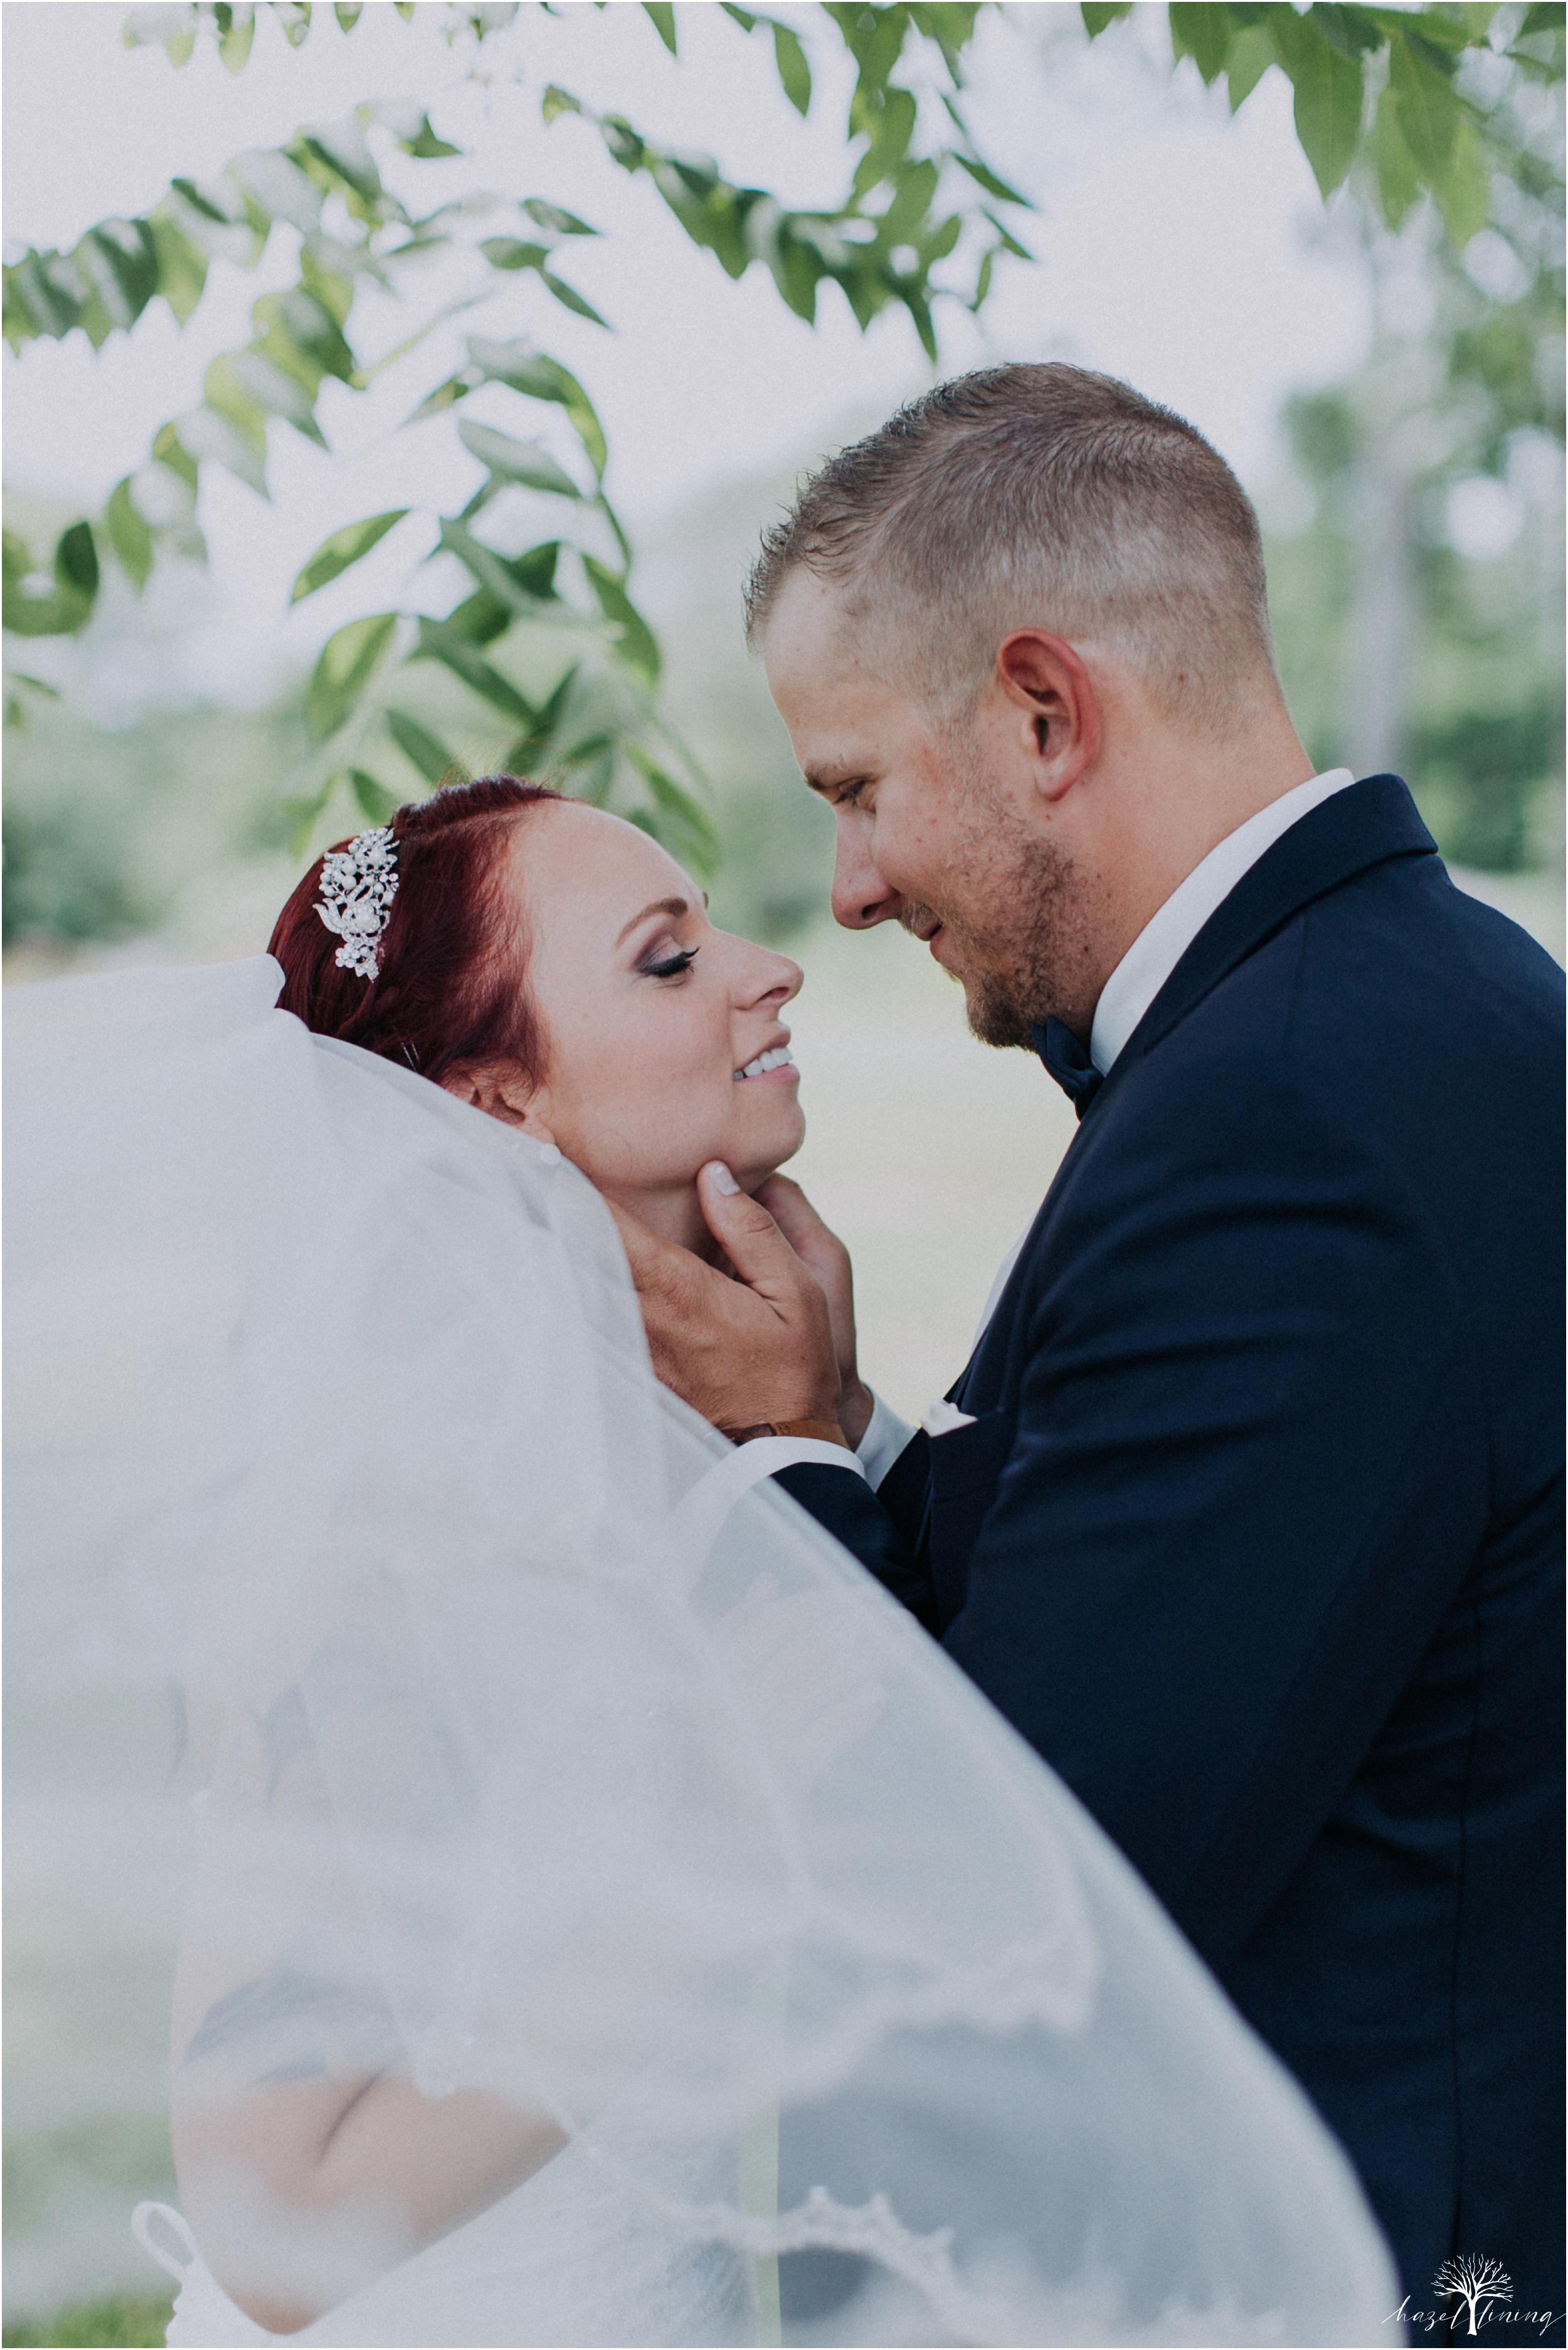 alyssa-james-stiteler-wedding-loft-and-sweet-water-cc-pennsburg-pennsylvania-hazel-lining-travel-wedding-elopement-photography_0036.jpg